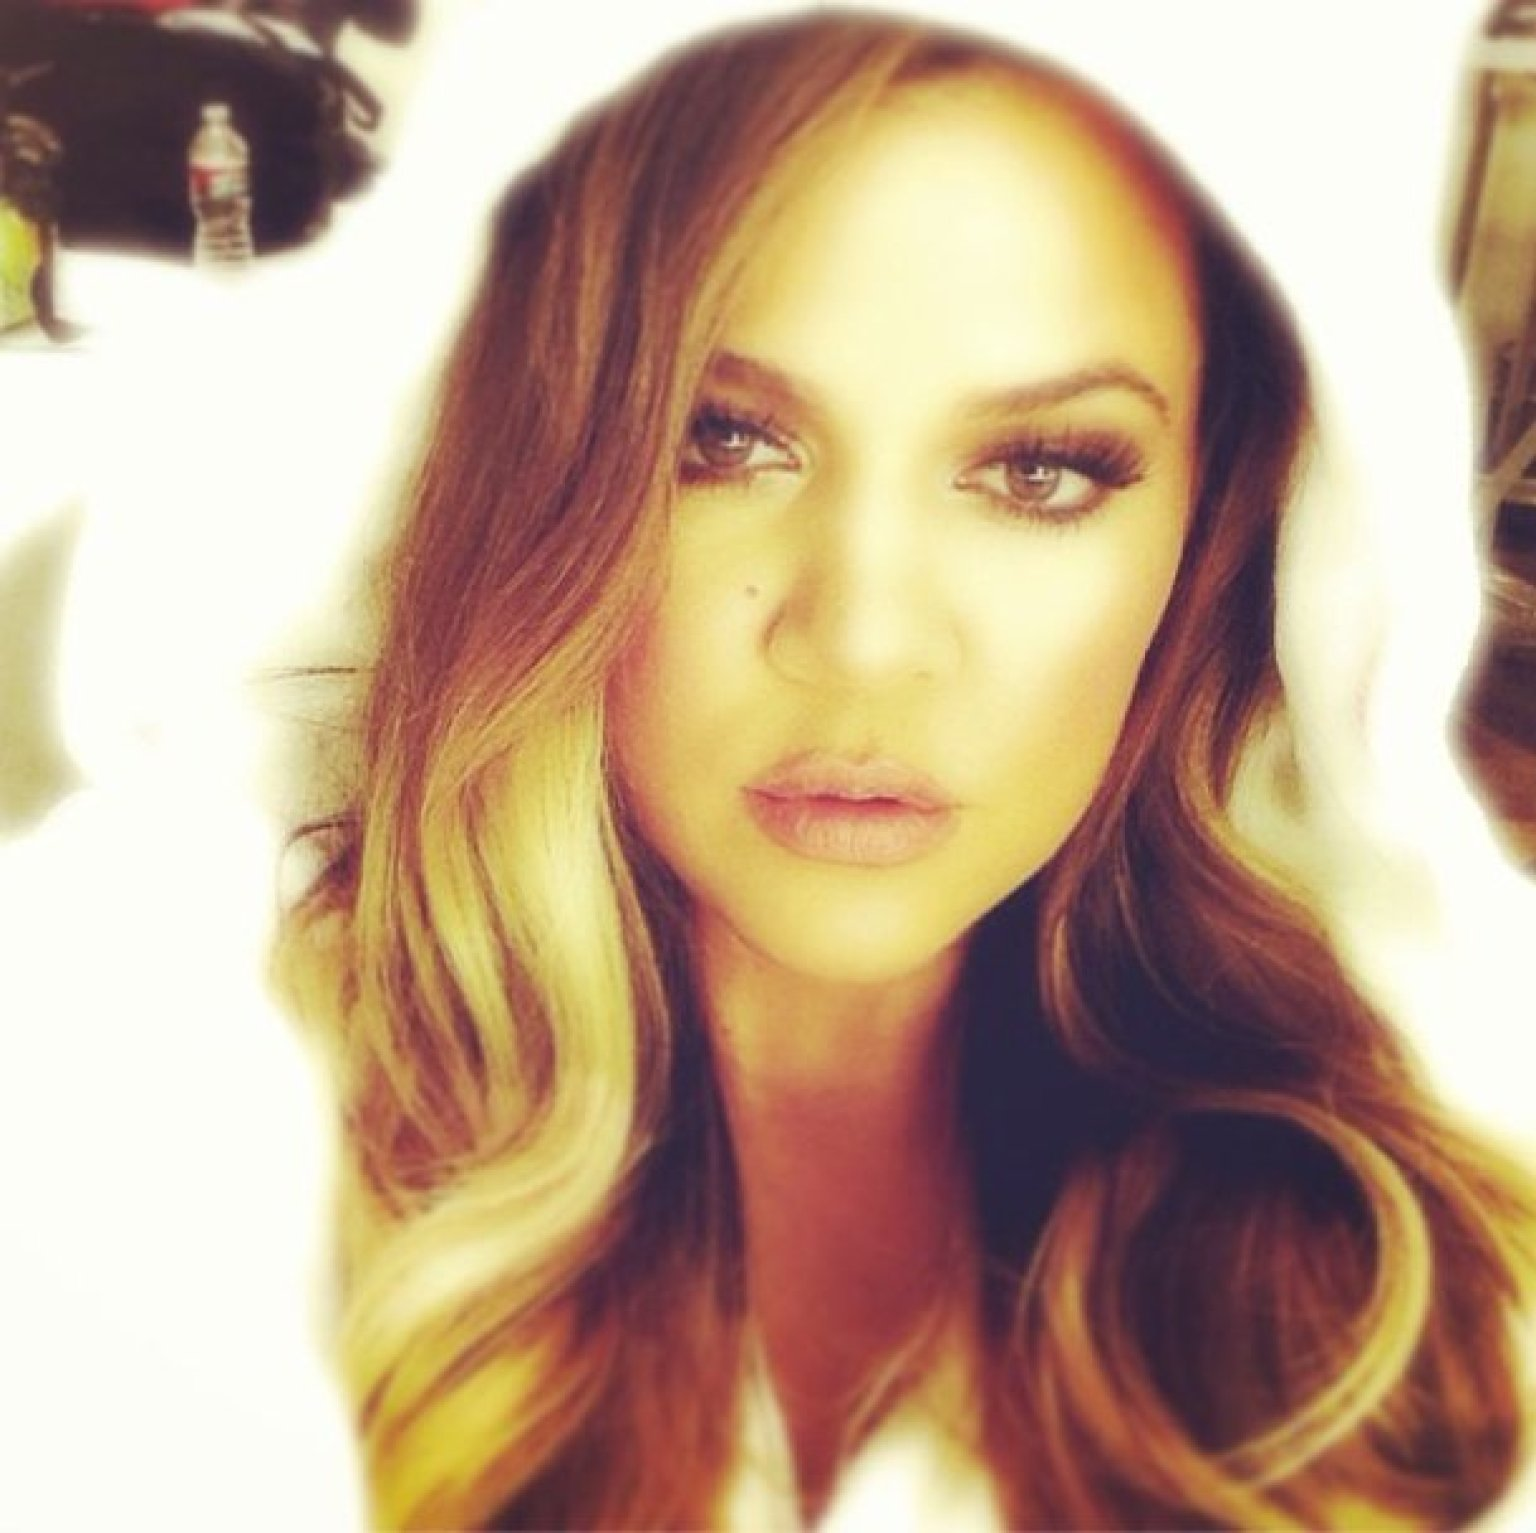 Khloe Kardashian Posts About Being 'Your Own Hero' Amid Lamar Odom ...